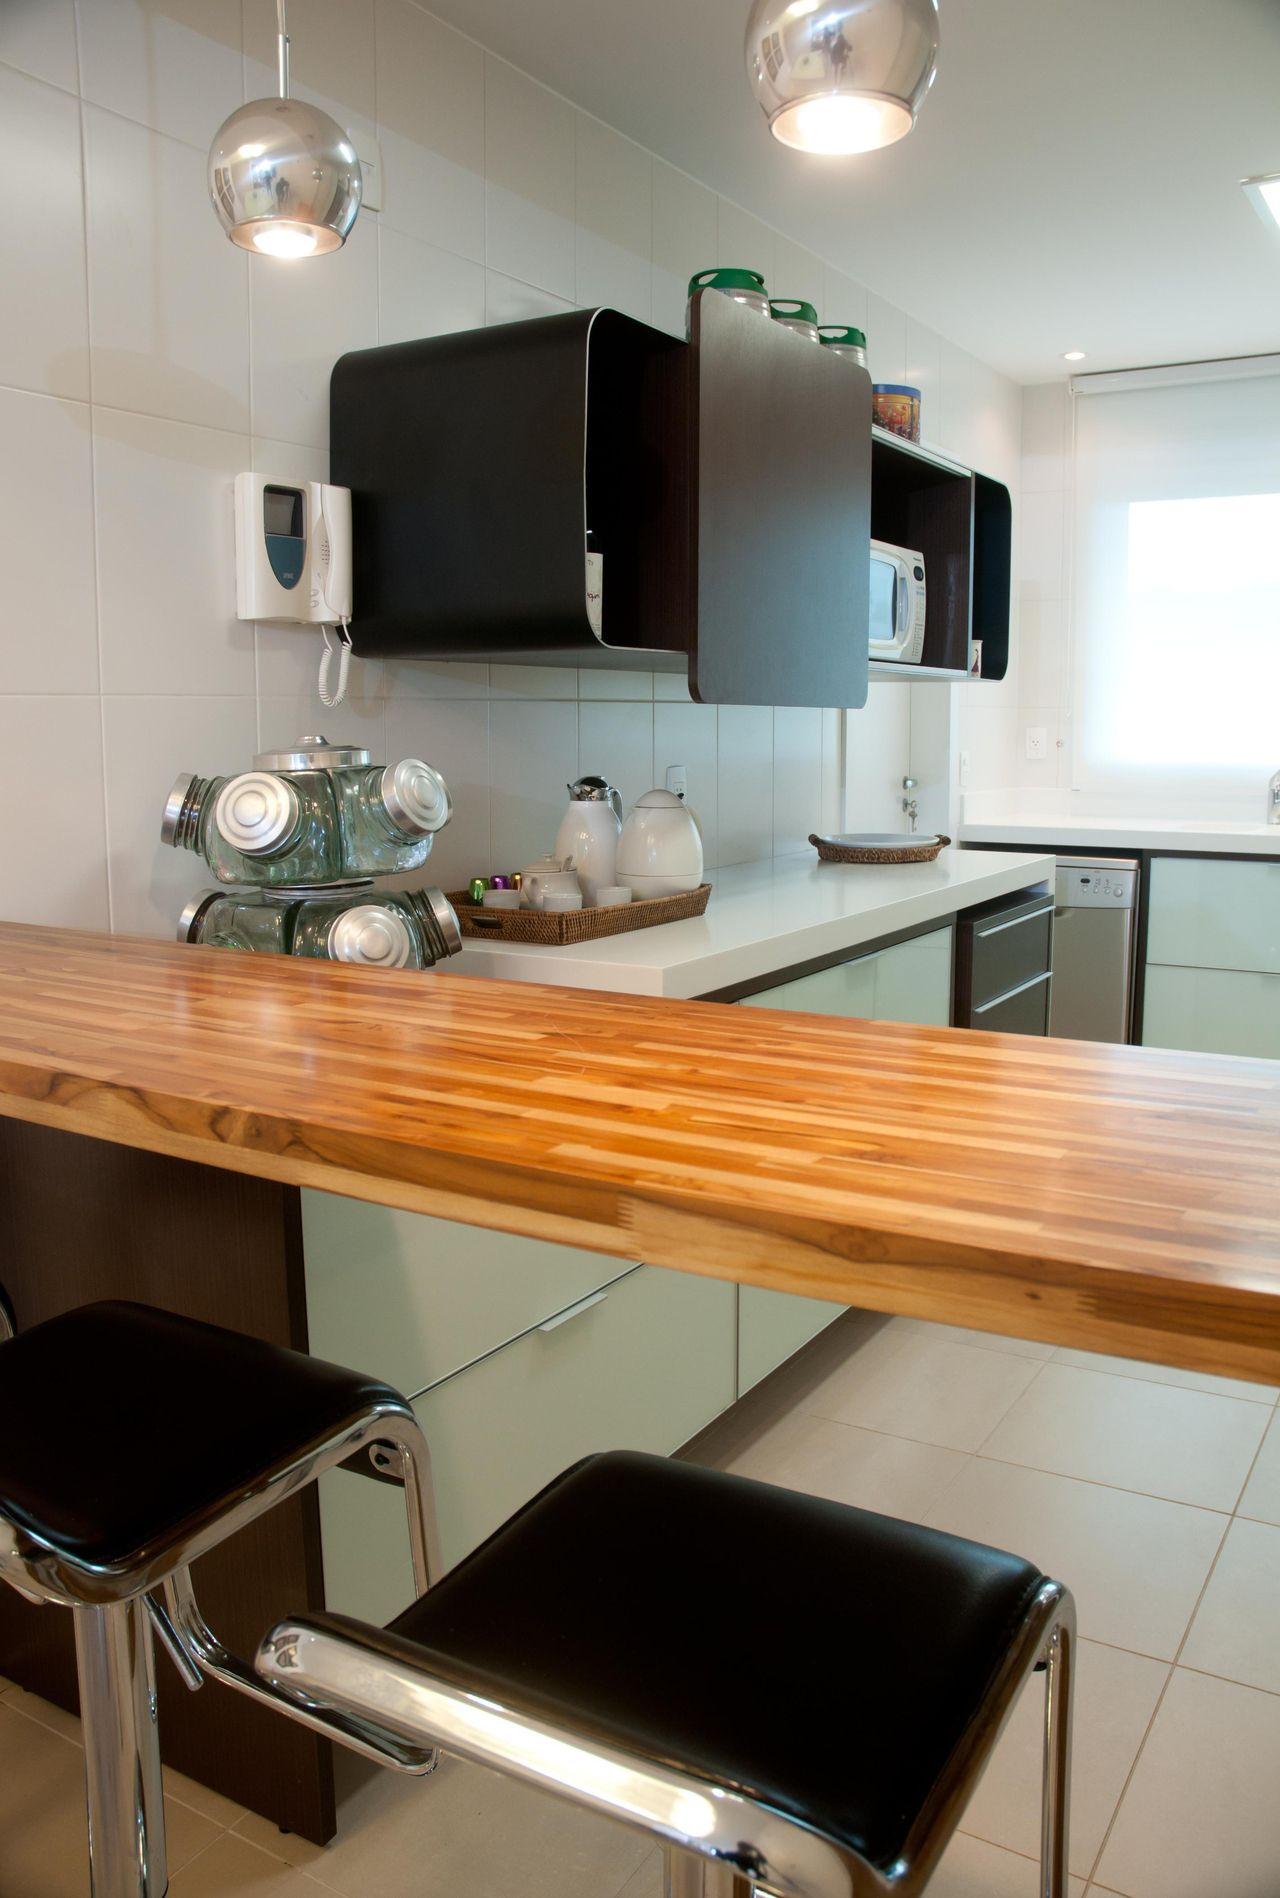 Pro Int Apartamento Lagoinha De Archdesign Studio 11300 No Viva